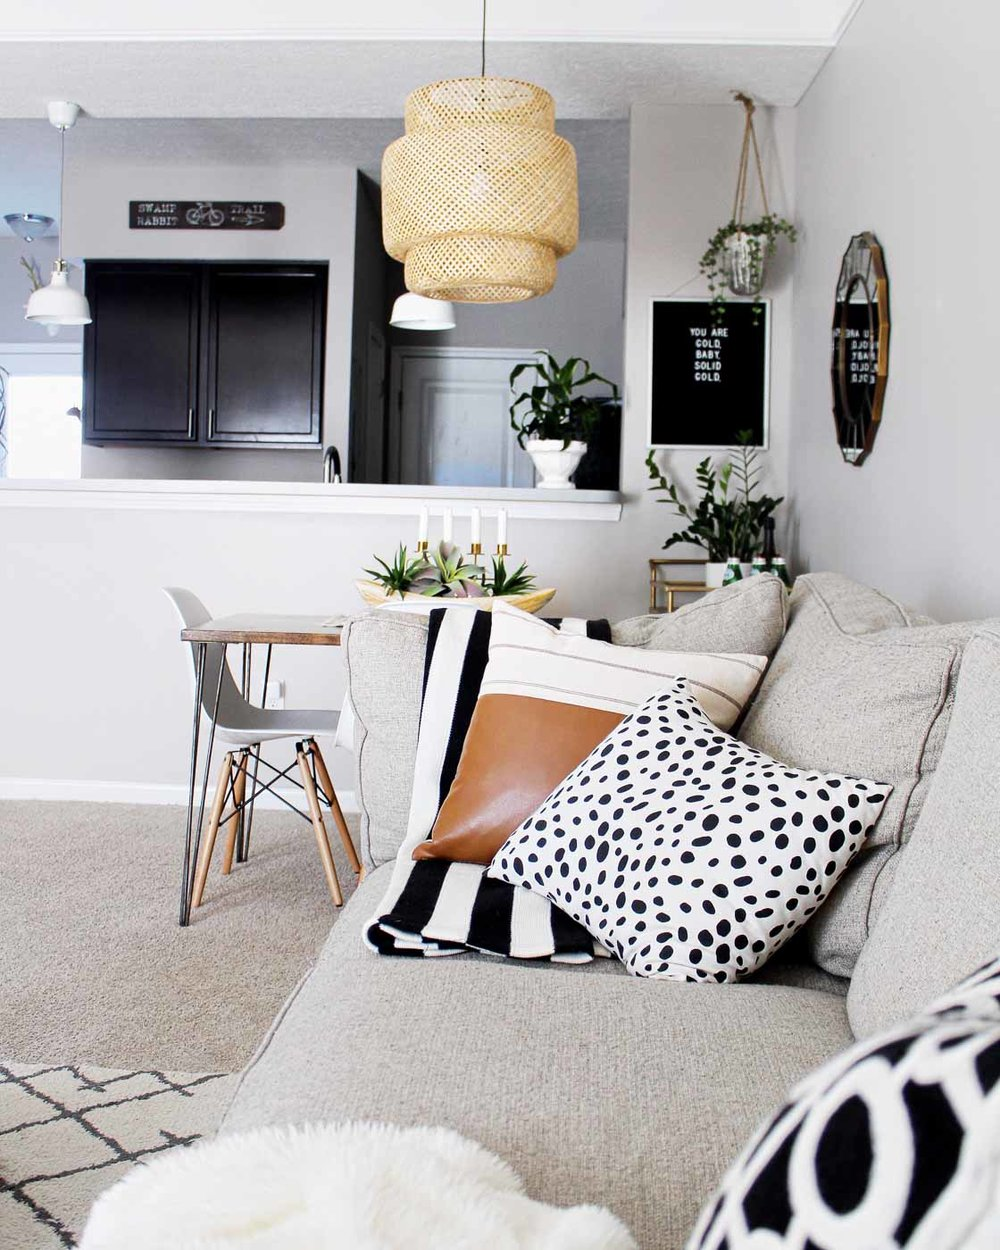 cozy-quarters-ohio-natural-light-photography-studio-lifestyle-photographer-2.jpg